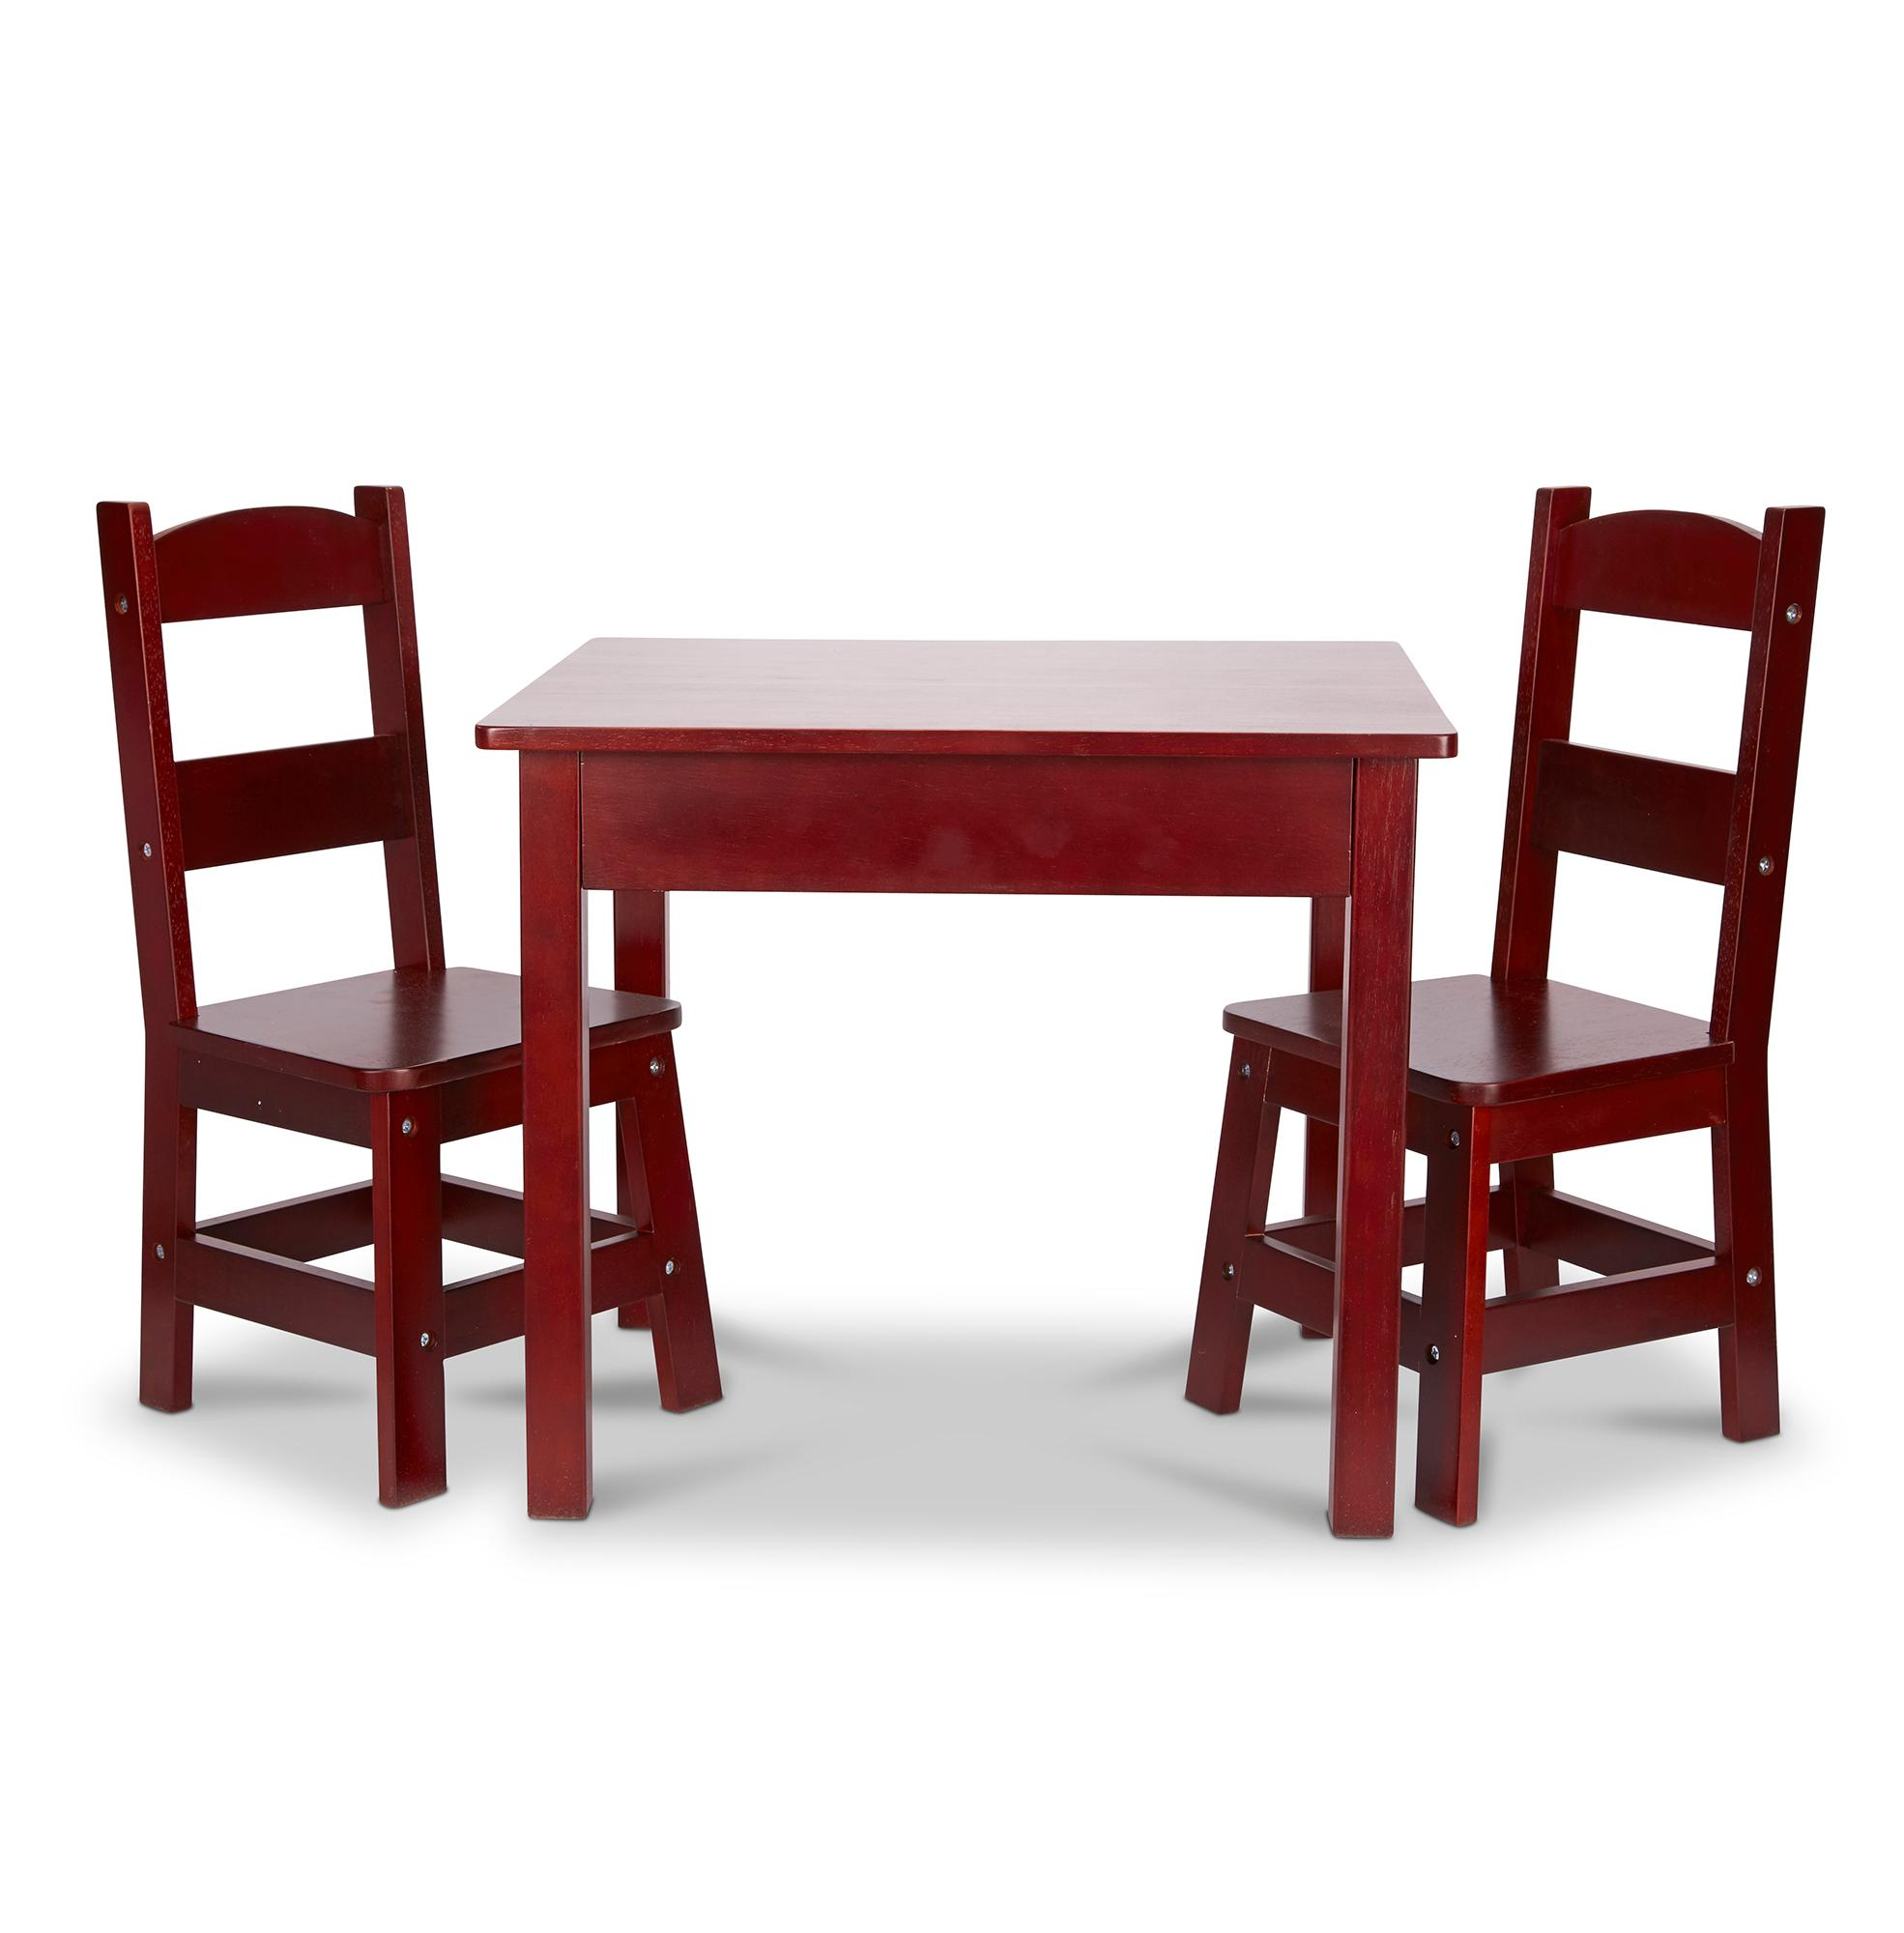 Amazon.com: Melissa & Doug Table & Chair - Painted Espresso ...